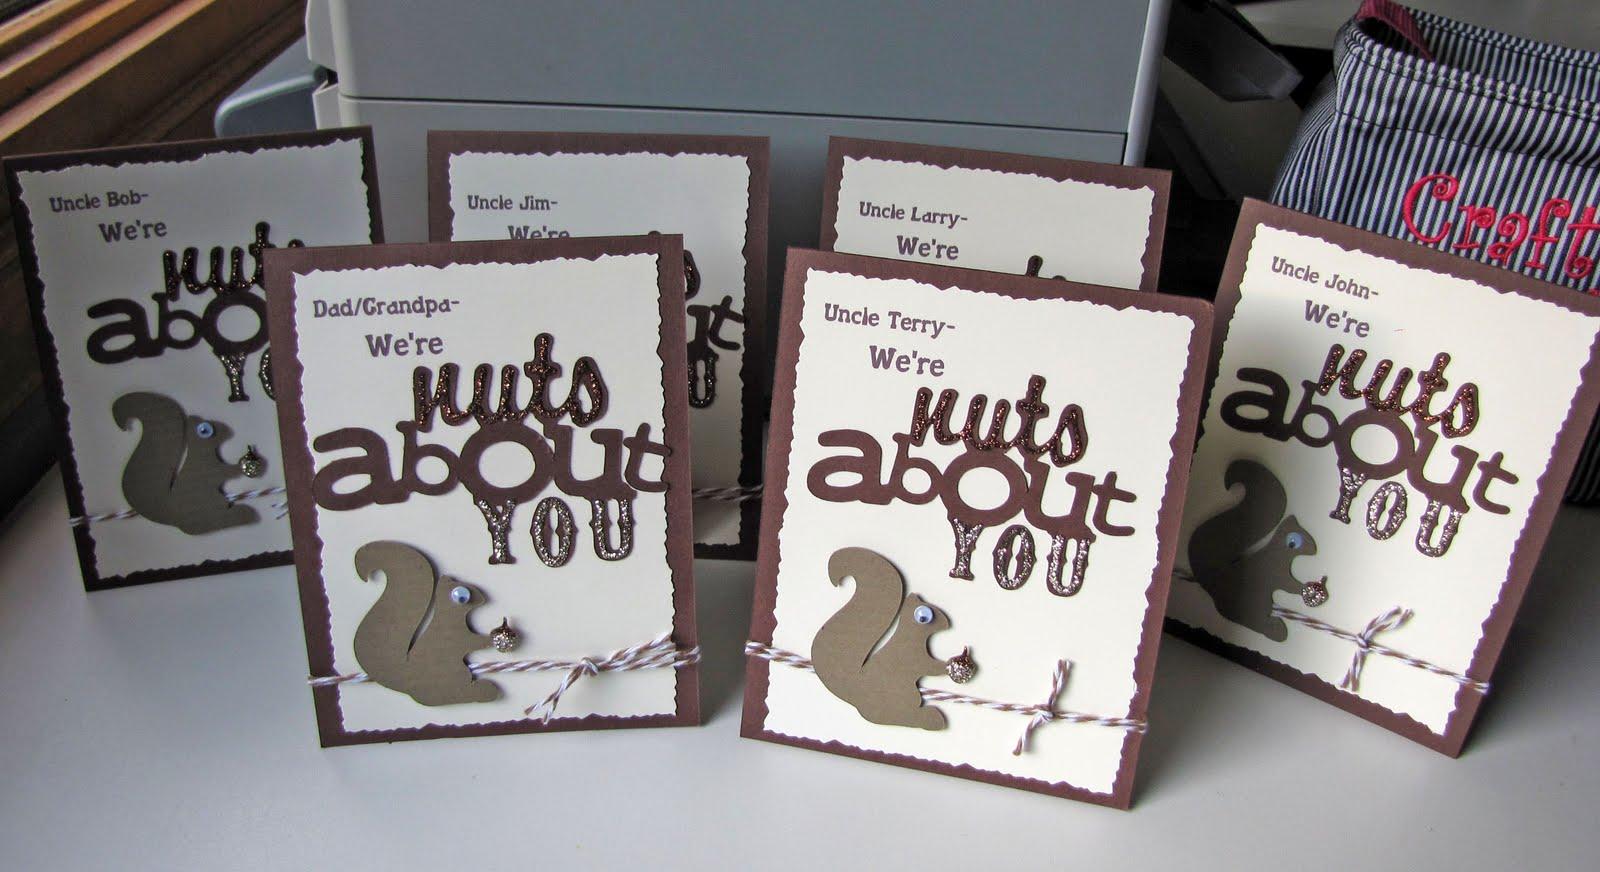 http://1.bp.blogspot.com/-UmVyxnO3d5s/Tf4M3K8RtYI/AAAAAAAAASk/w3bOGYwNba8/s1600/Fathers+Day+2011+Cards.JPG